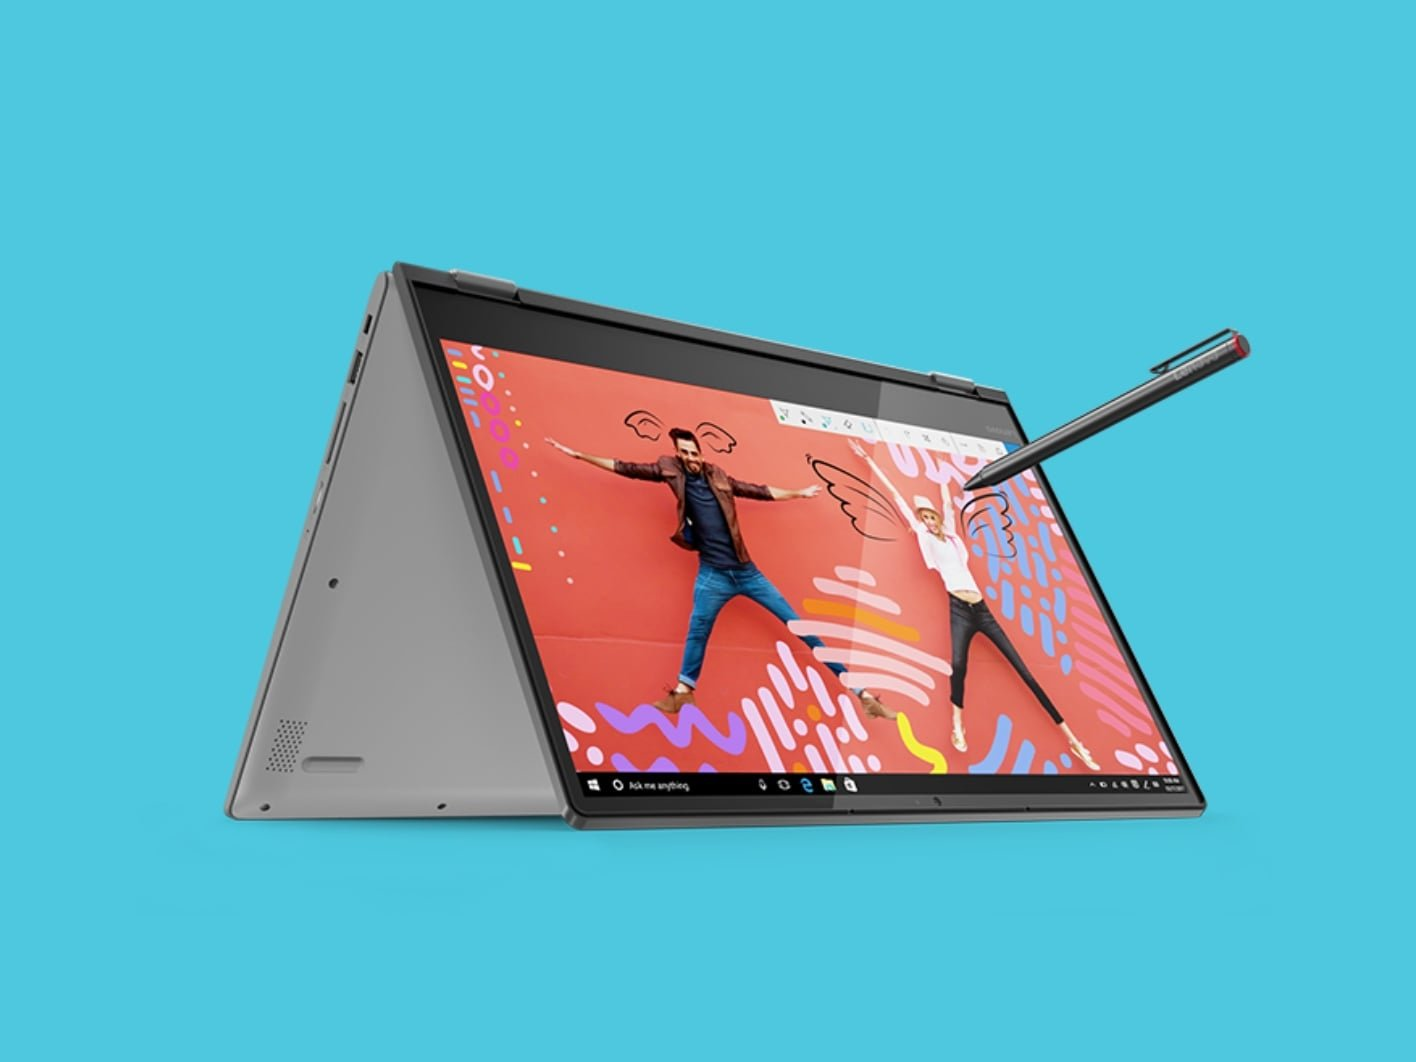 Lenovo Flex 14 Ultra-Thin 2-in-1 Laptop